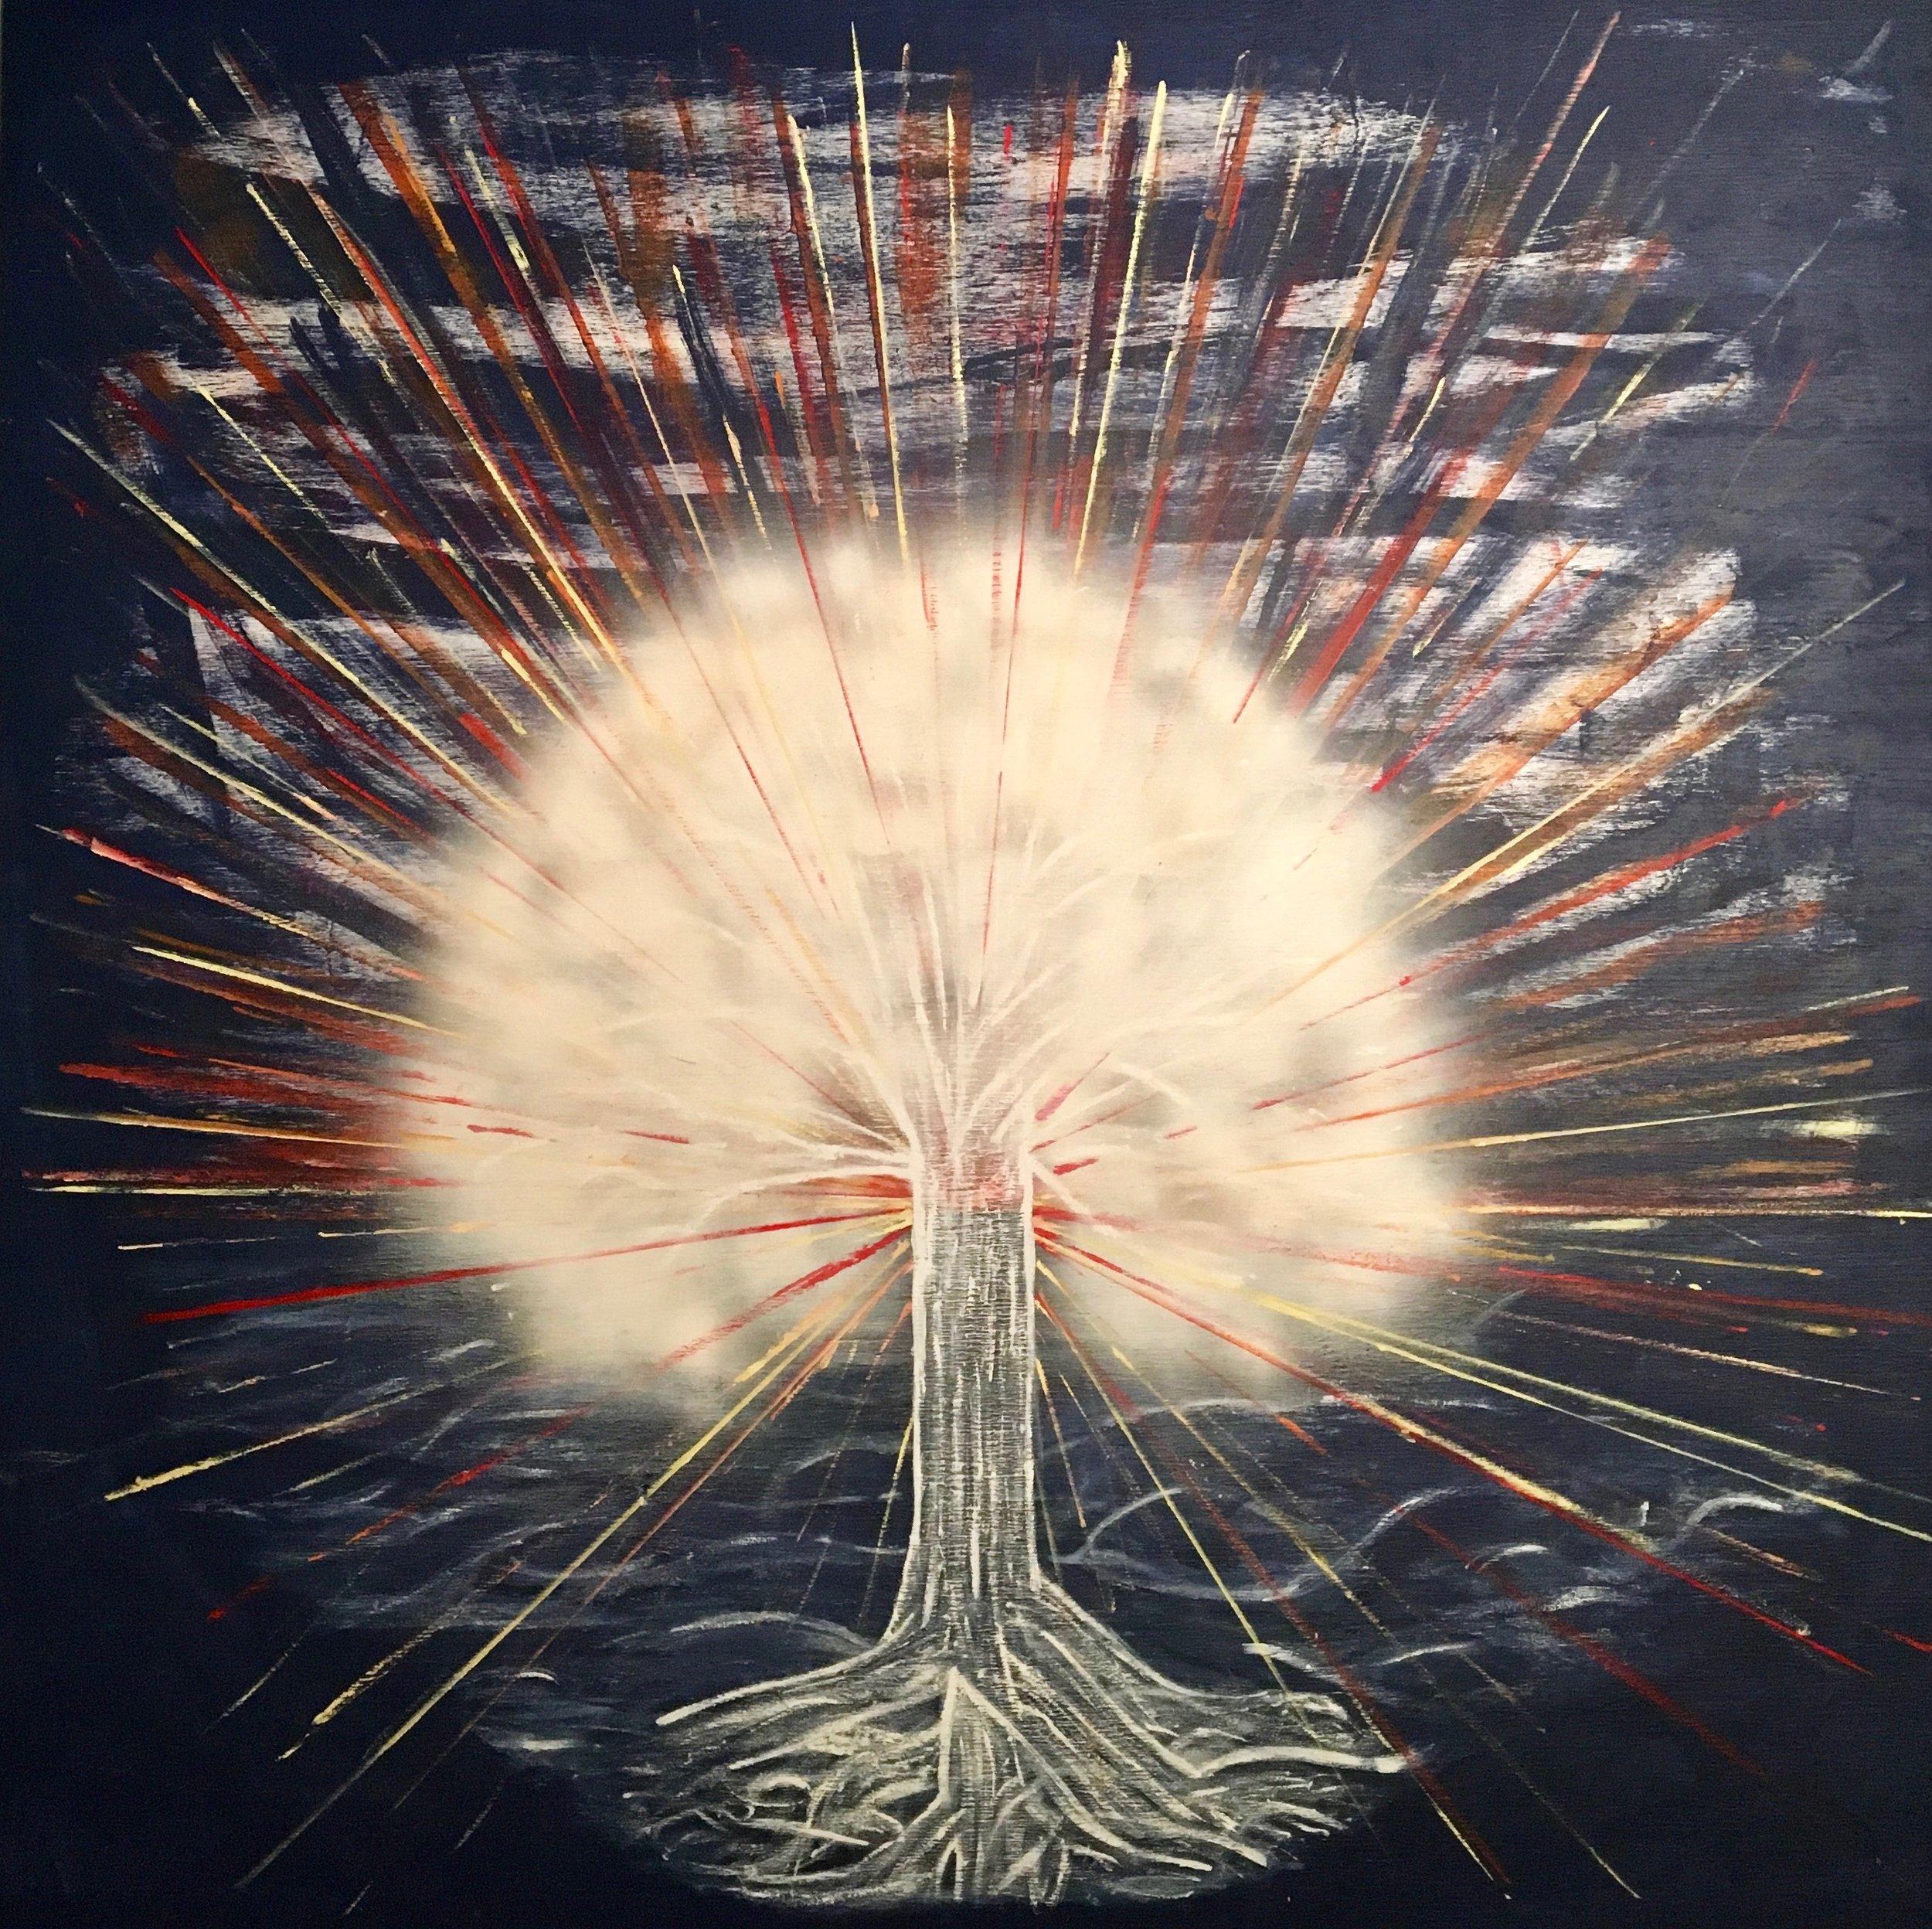 TREE OF LIGHT - Paint on 4x4 Wood Panel by Aaron Berg